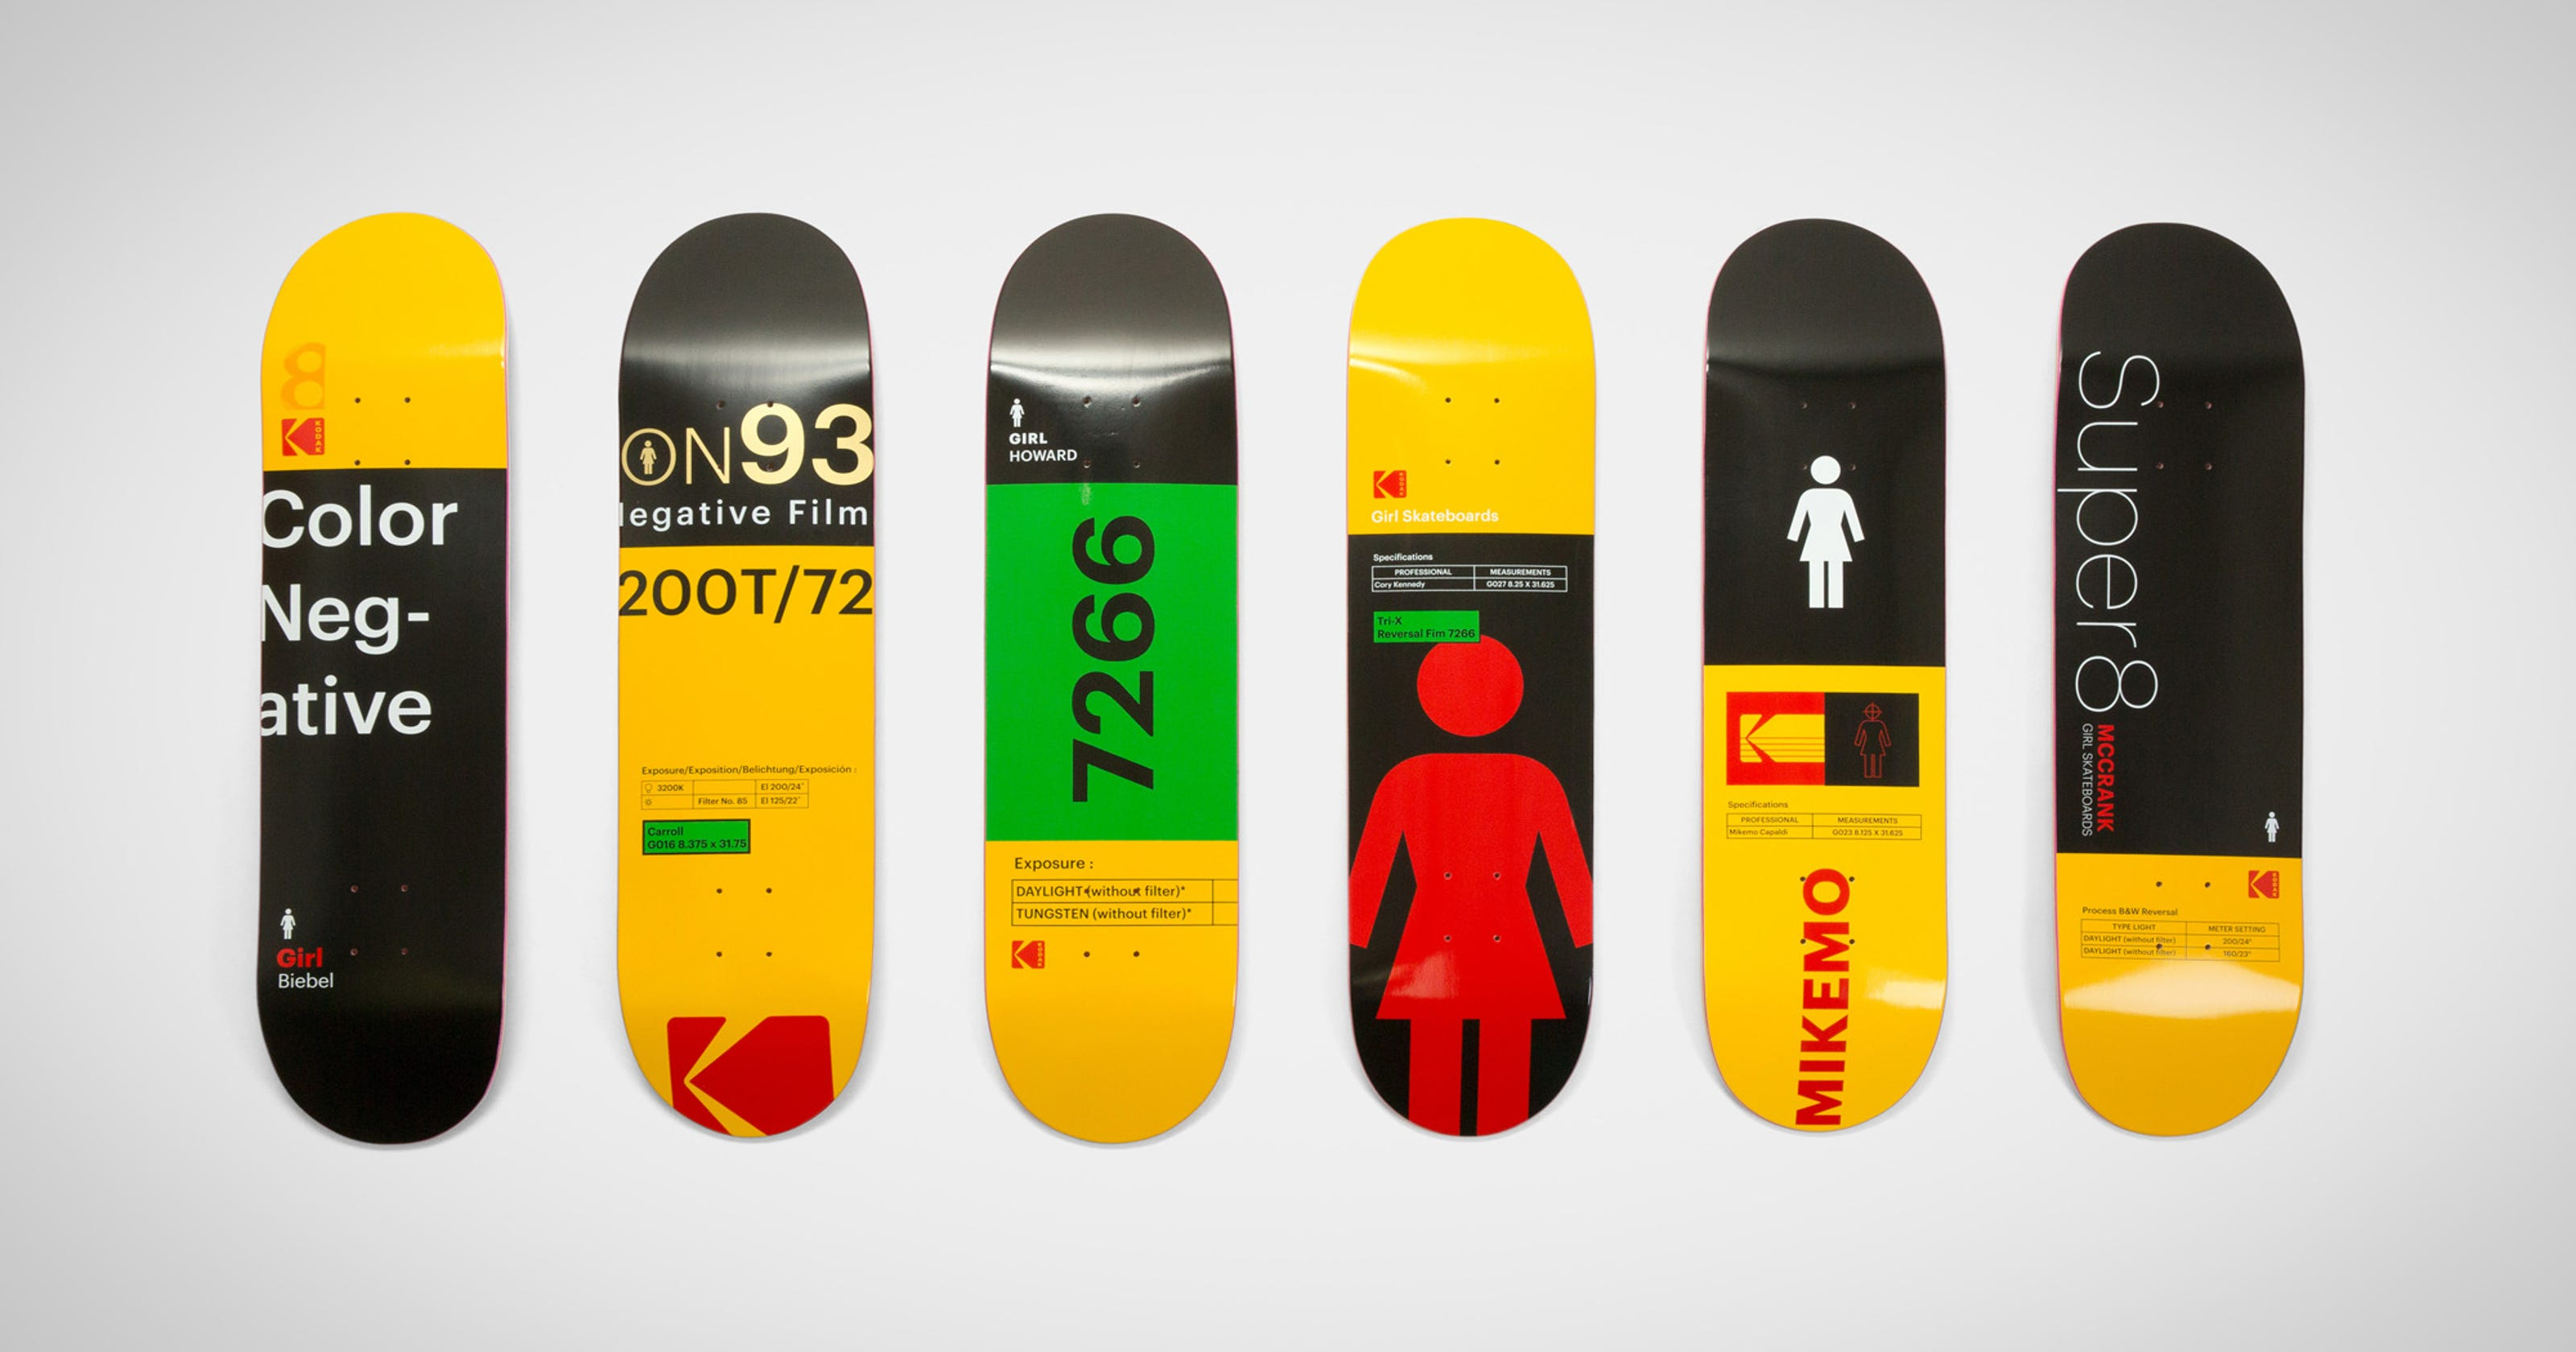 Rochester S Kodak Brand Rides Along With Skateboarders